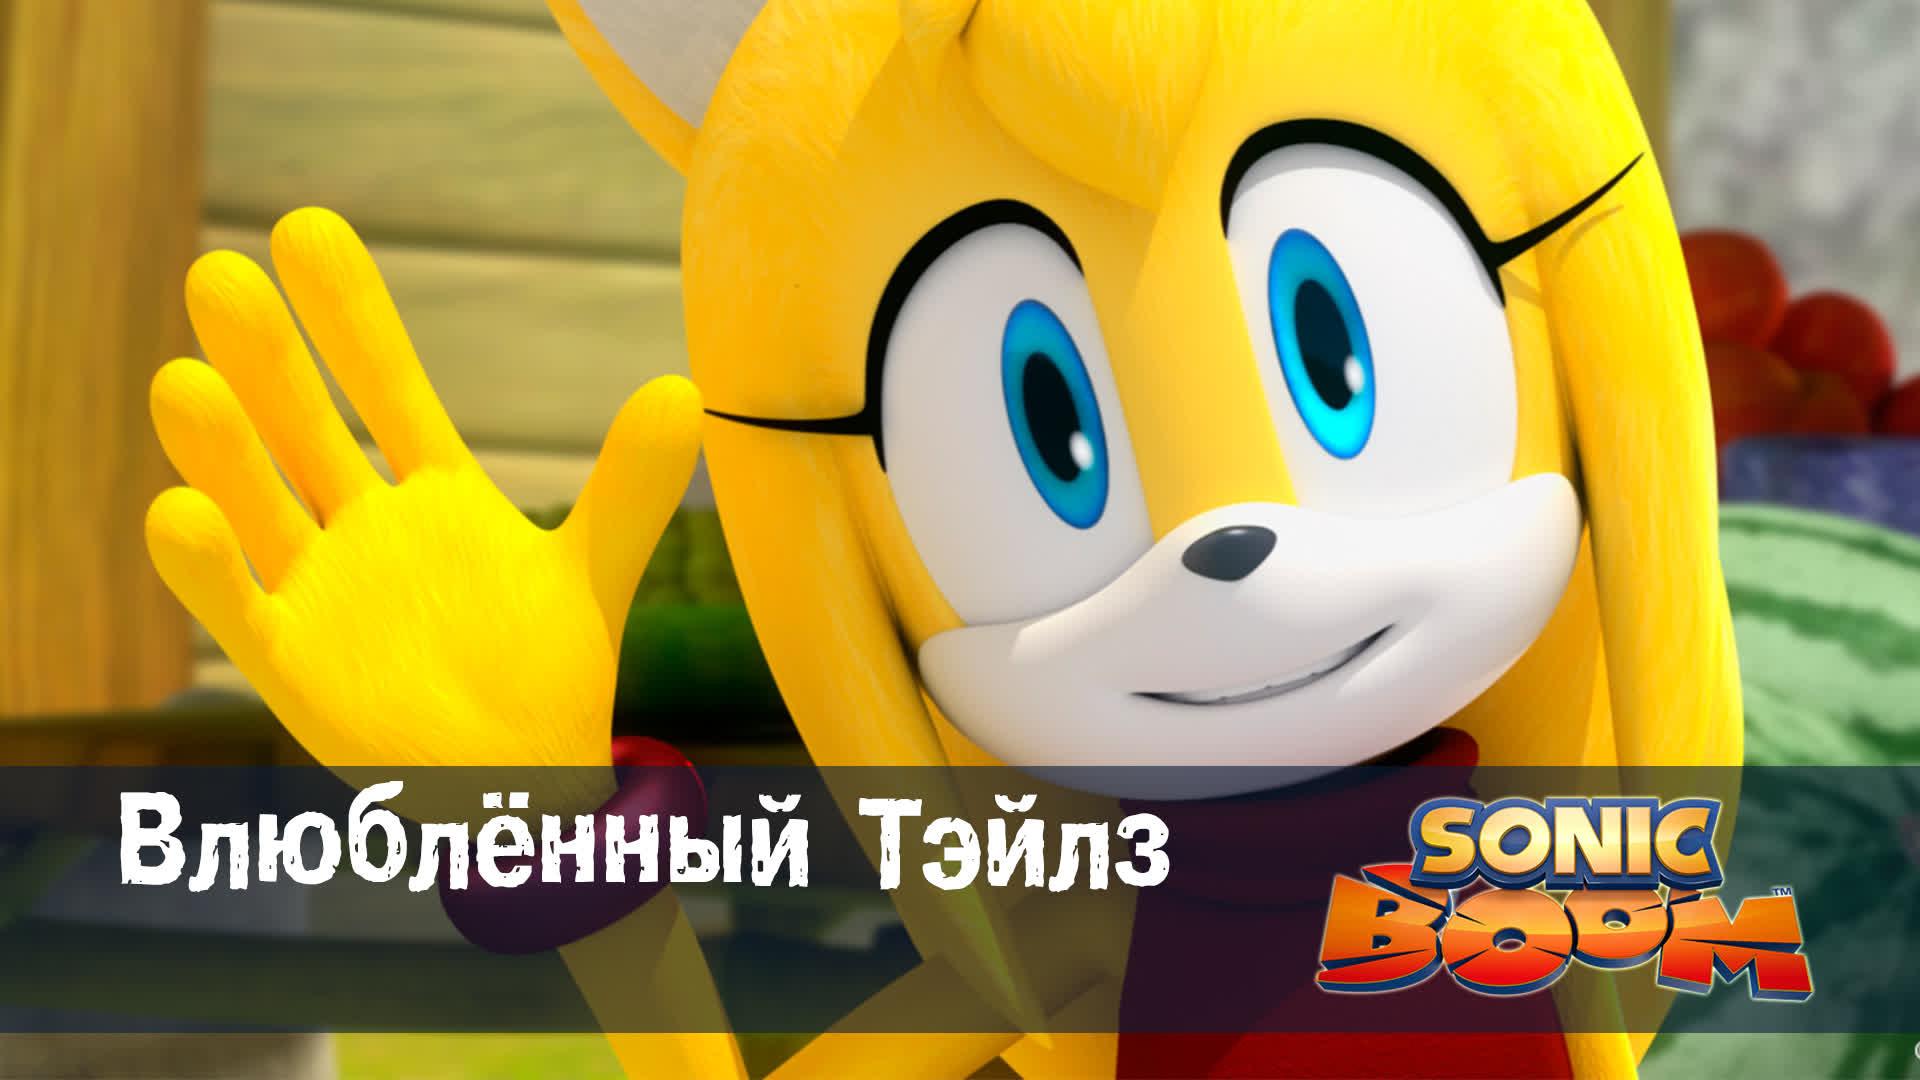 Соник Бум - Серия 40